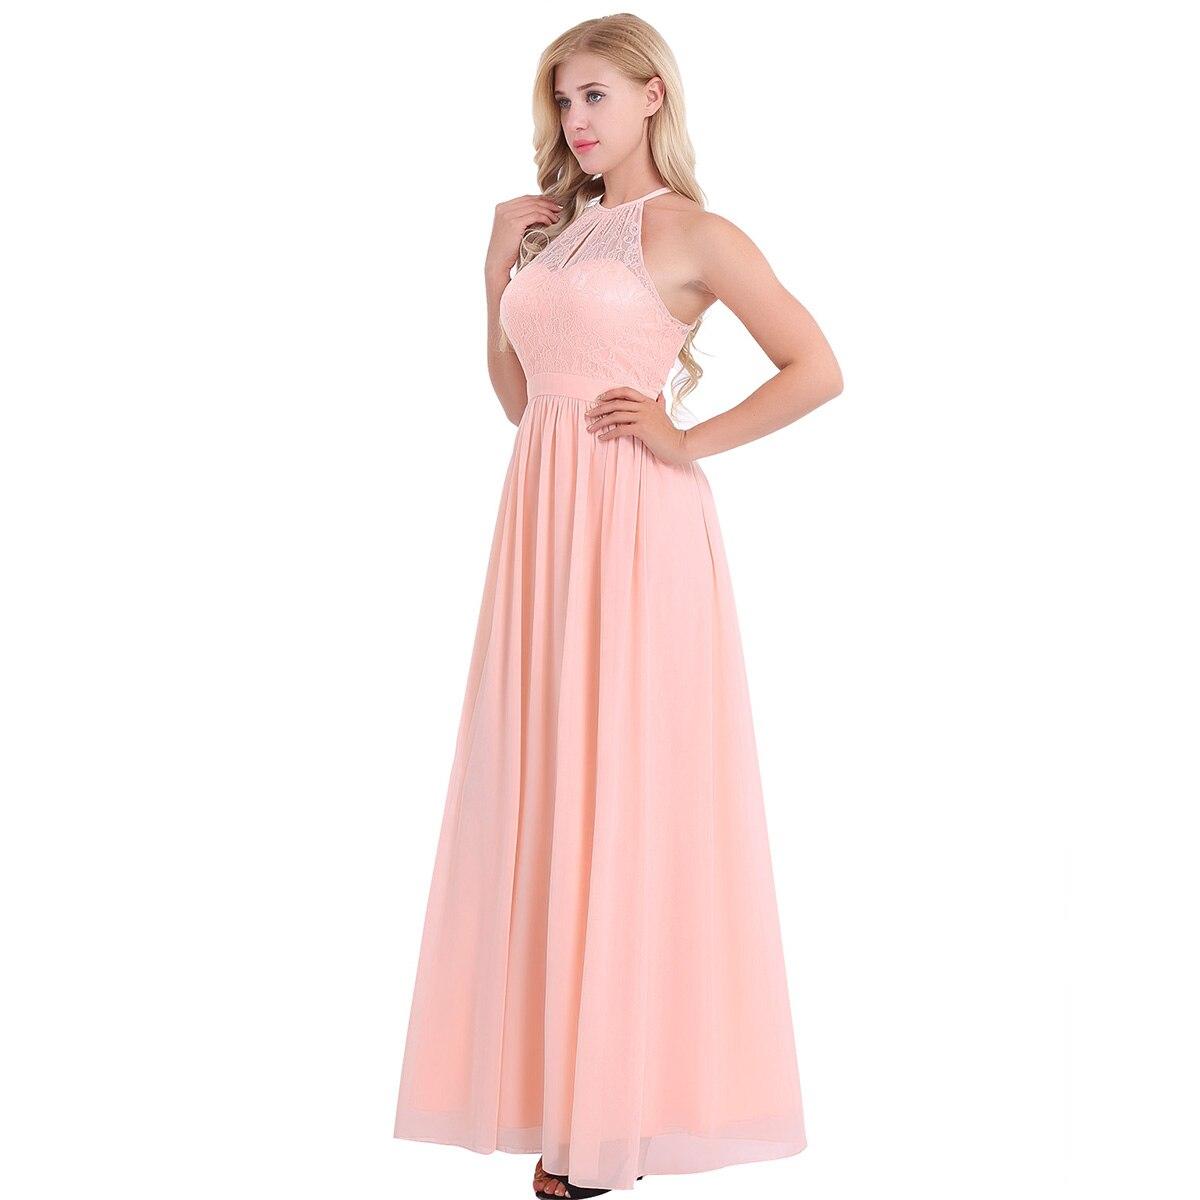 Image 3 - Women Ladies Neckline Halter Lace Floral Sleeveless Chiffon Dress Elegant Birthday Party Weeding Prom Gown First Communion Dresschiffon dressdress elegantelegant dress -